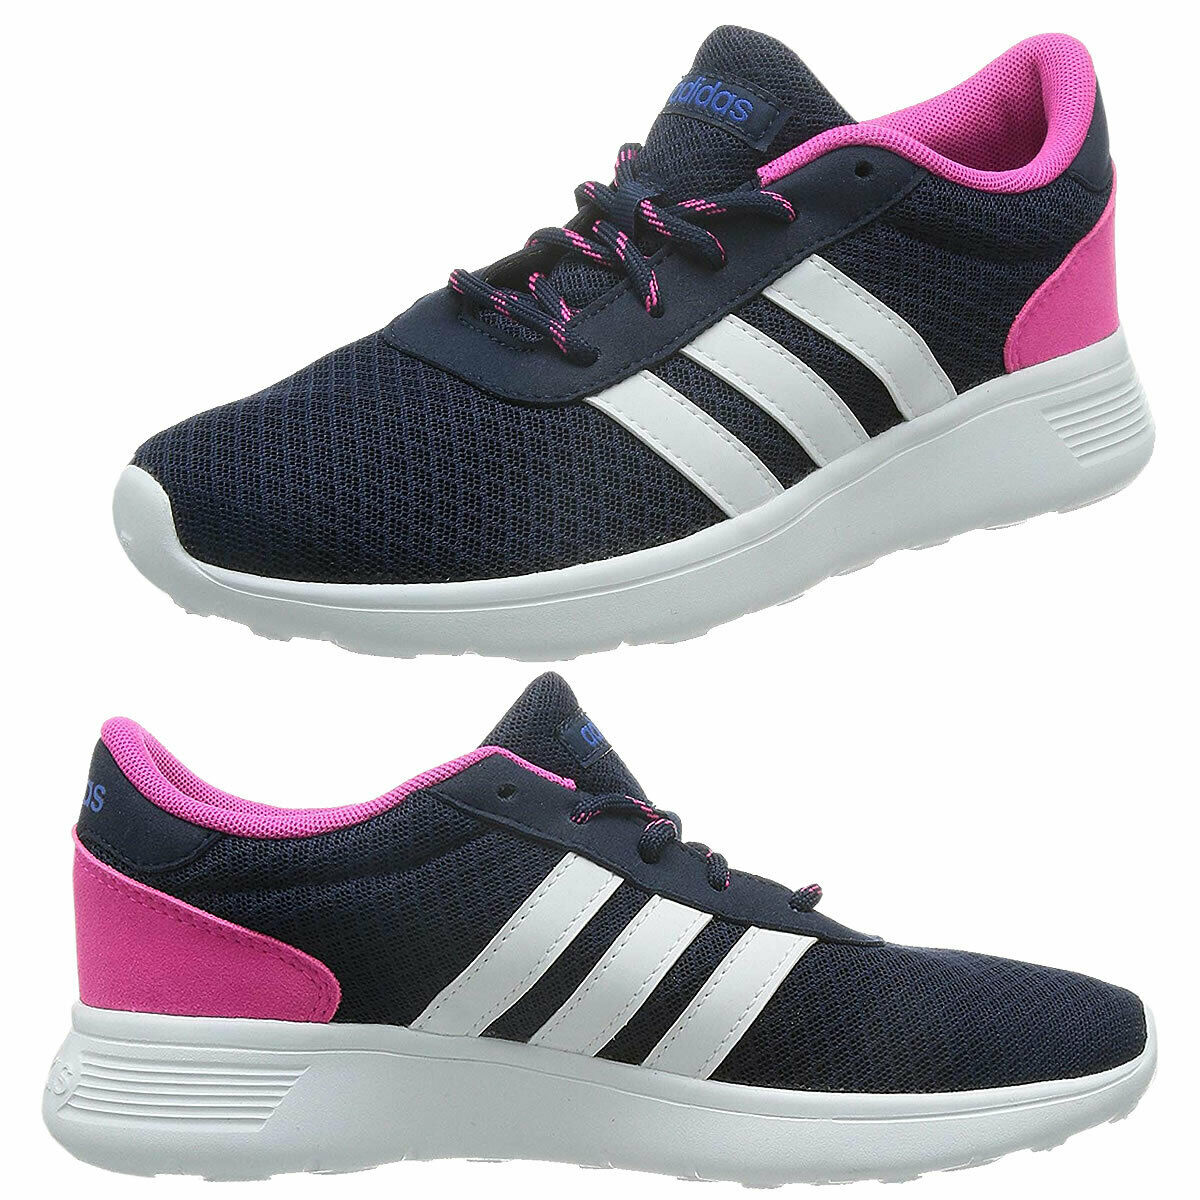 adidas Damen Schuhe Neo Sneaker Lite Racer Freizeit